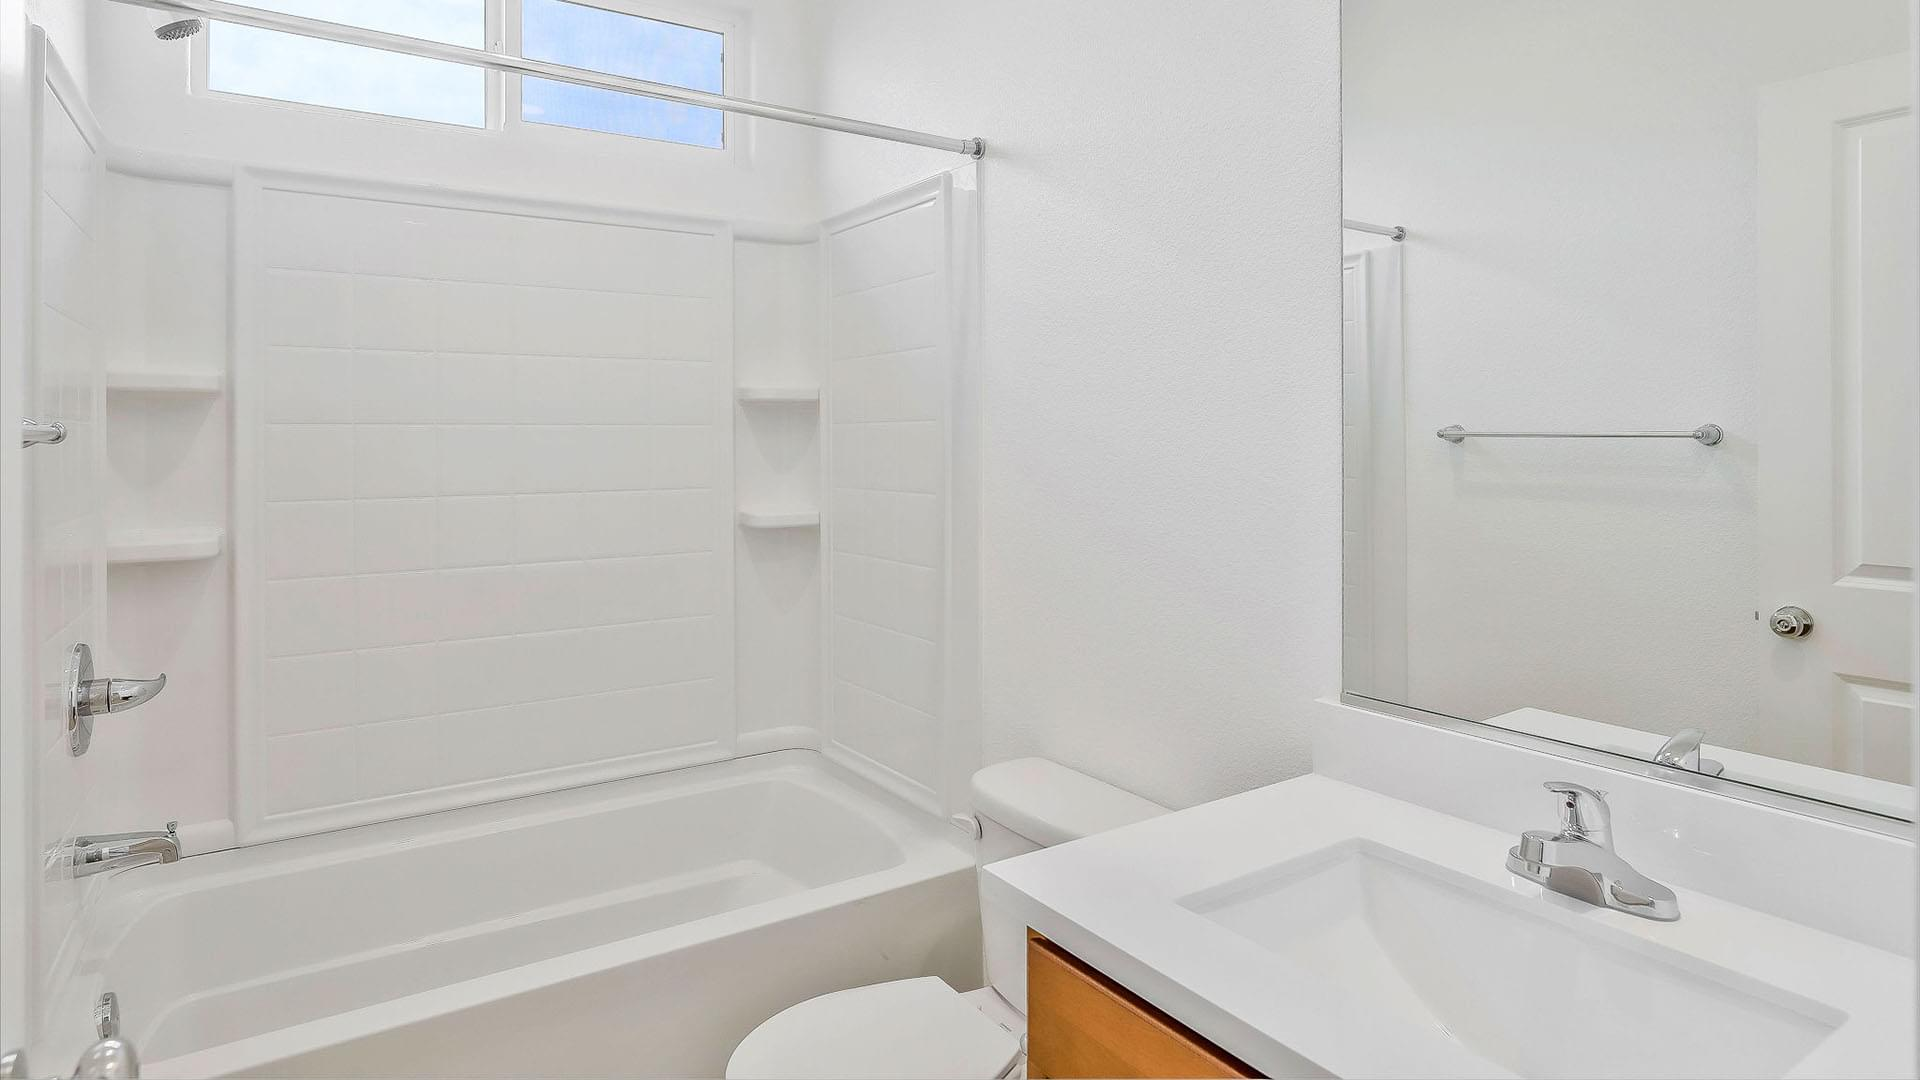 Residence 1 Bath 2